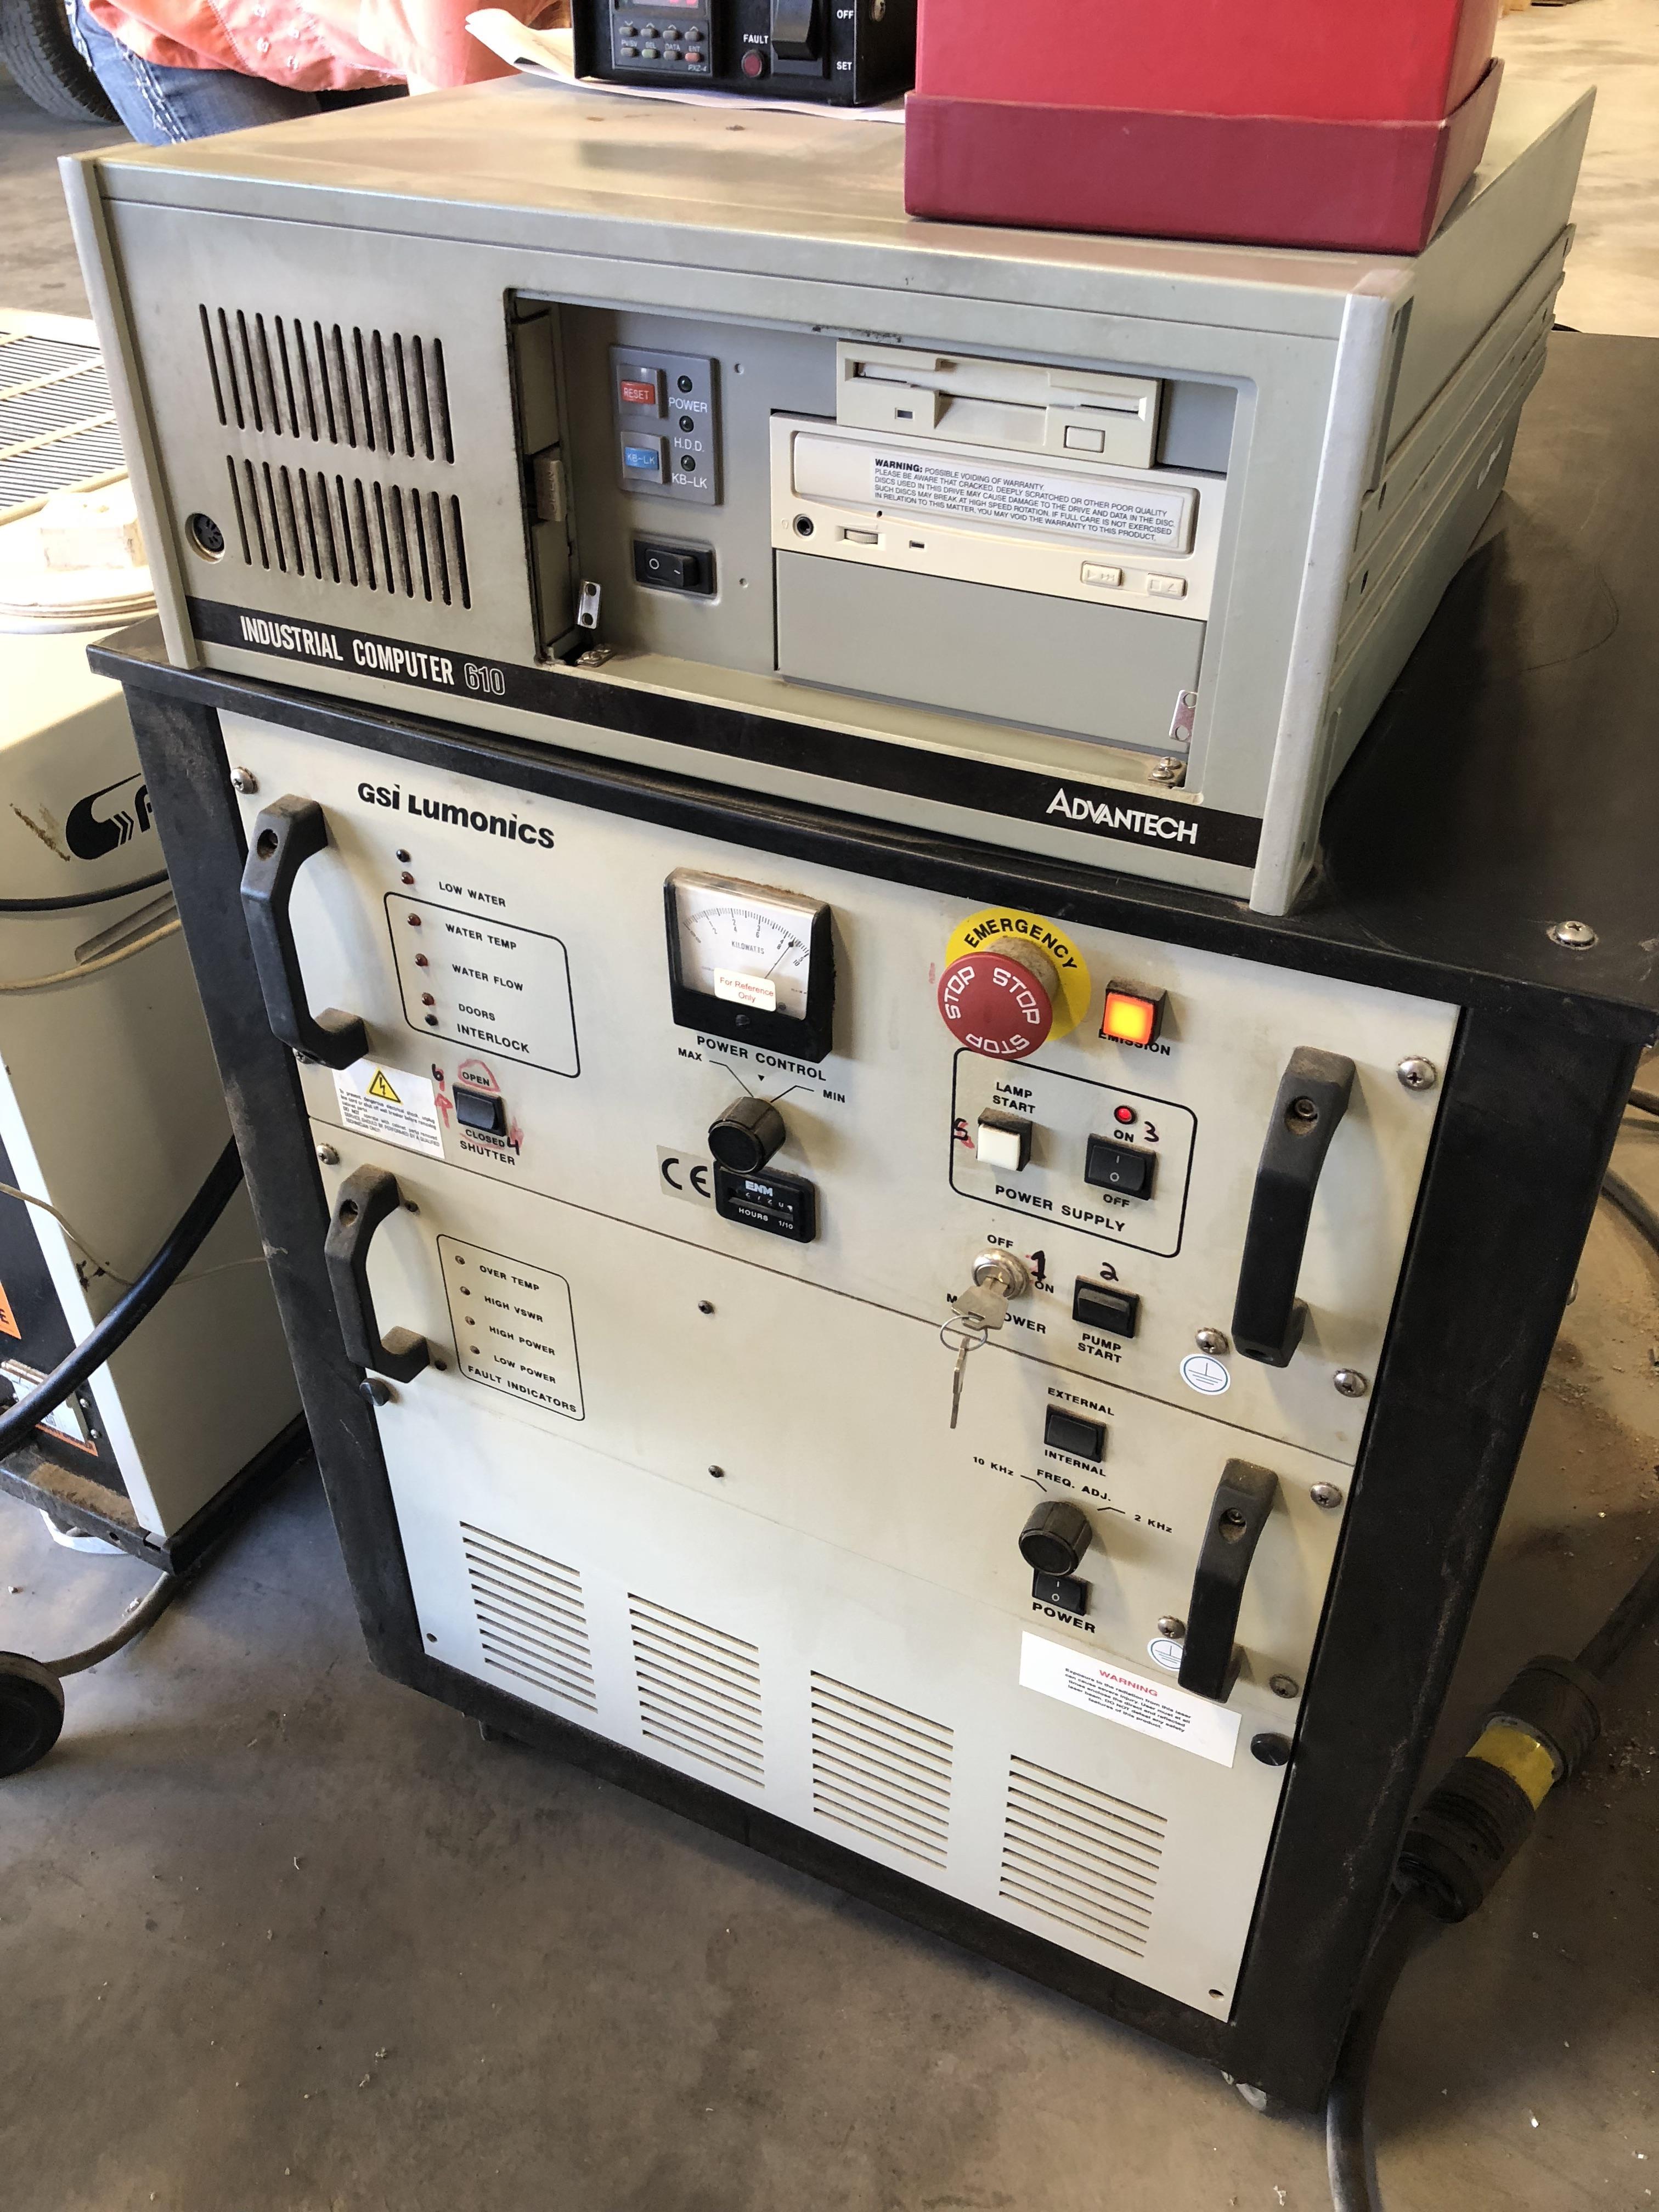 GSI Lumonics HM1400 Laser Marker w/YAG T818/FS/CE Laser, LPS 30 CCS Power Supply 100 watt, - Image 5 of 10